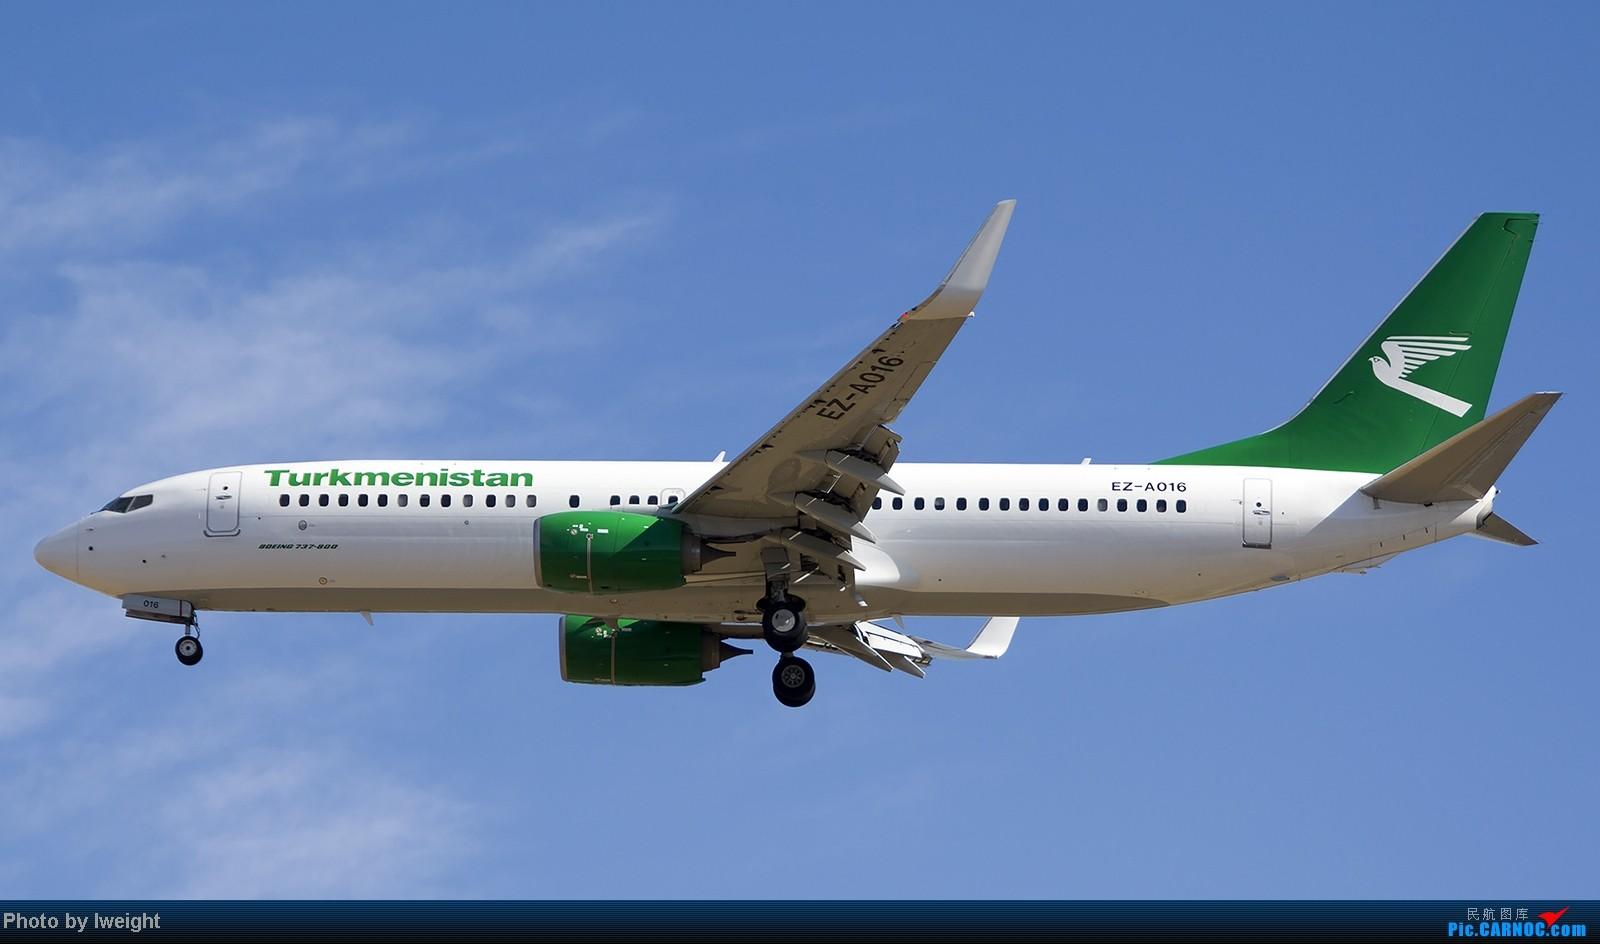 Re:[原创]终于盼来了晴天,PEK拍起【10月26日】 BOEING 737-800 EZ-A016 中国北京首都机场